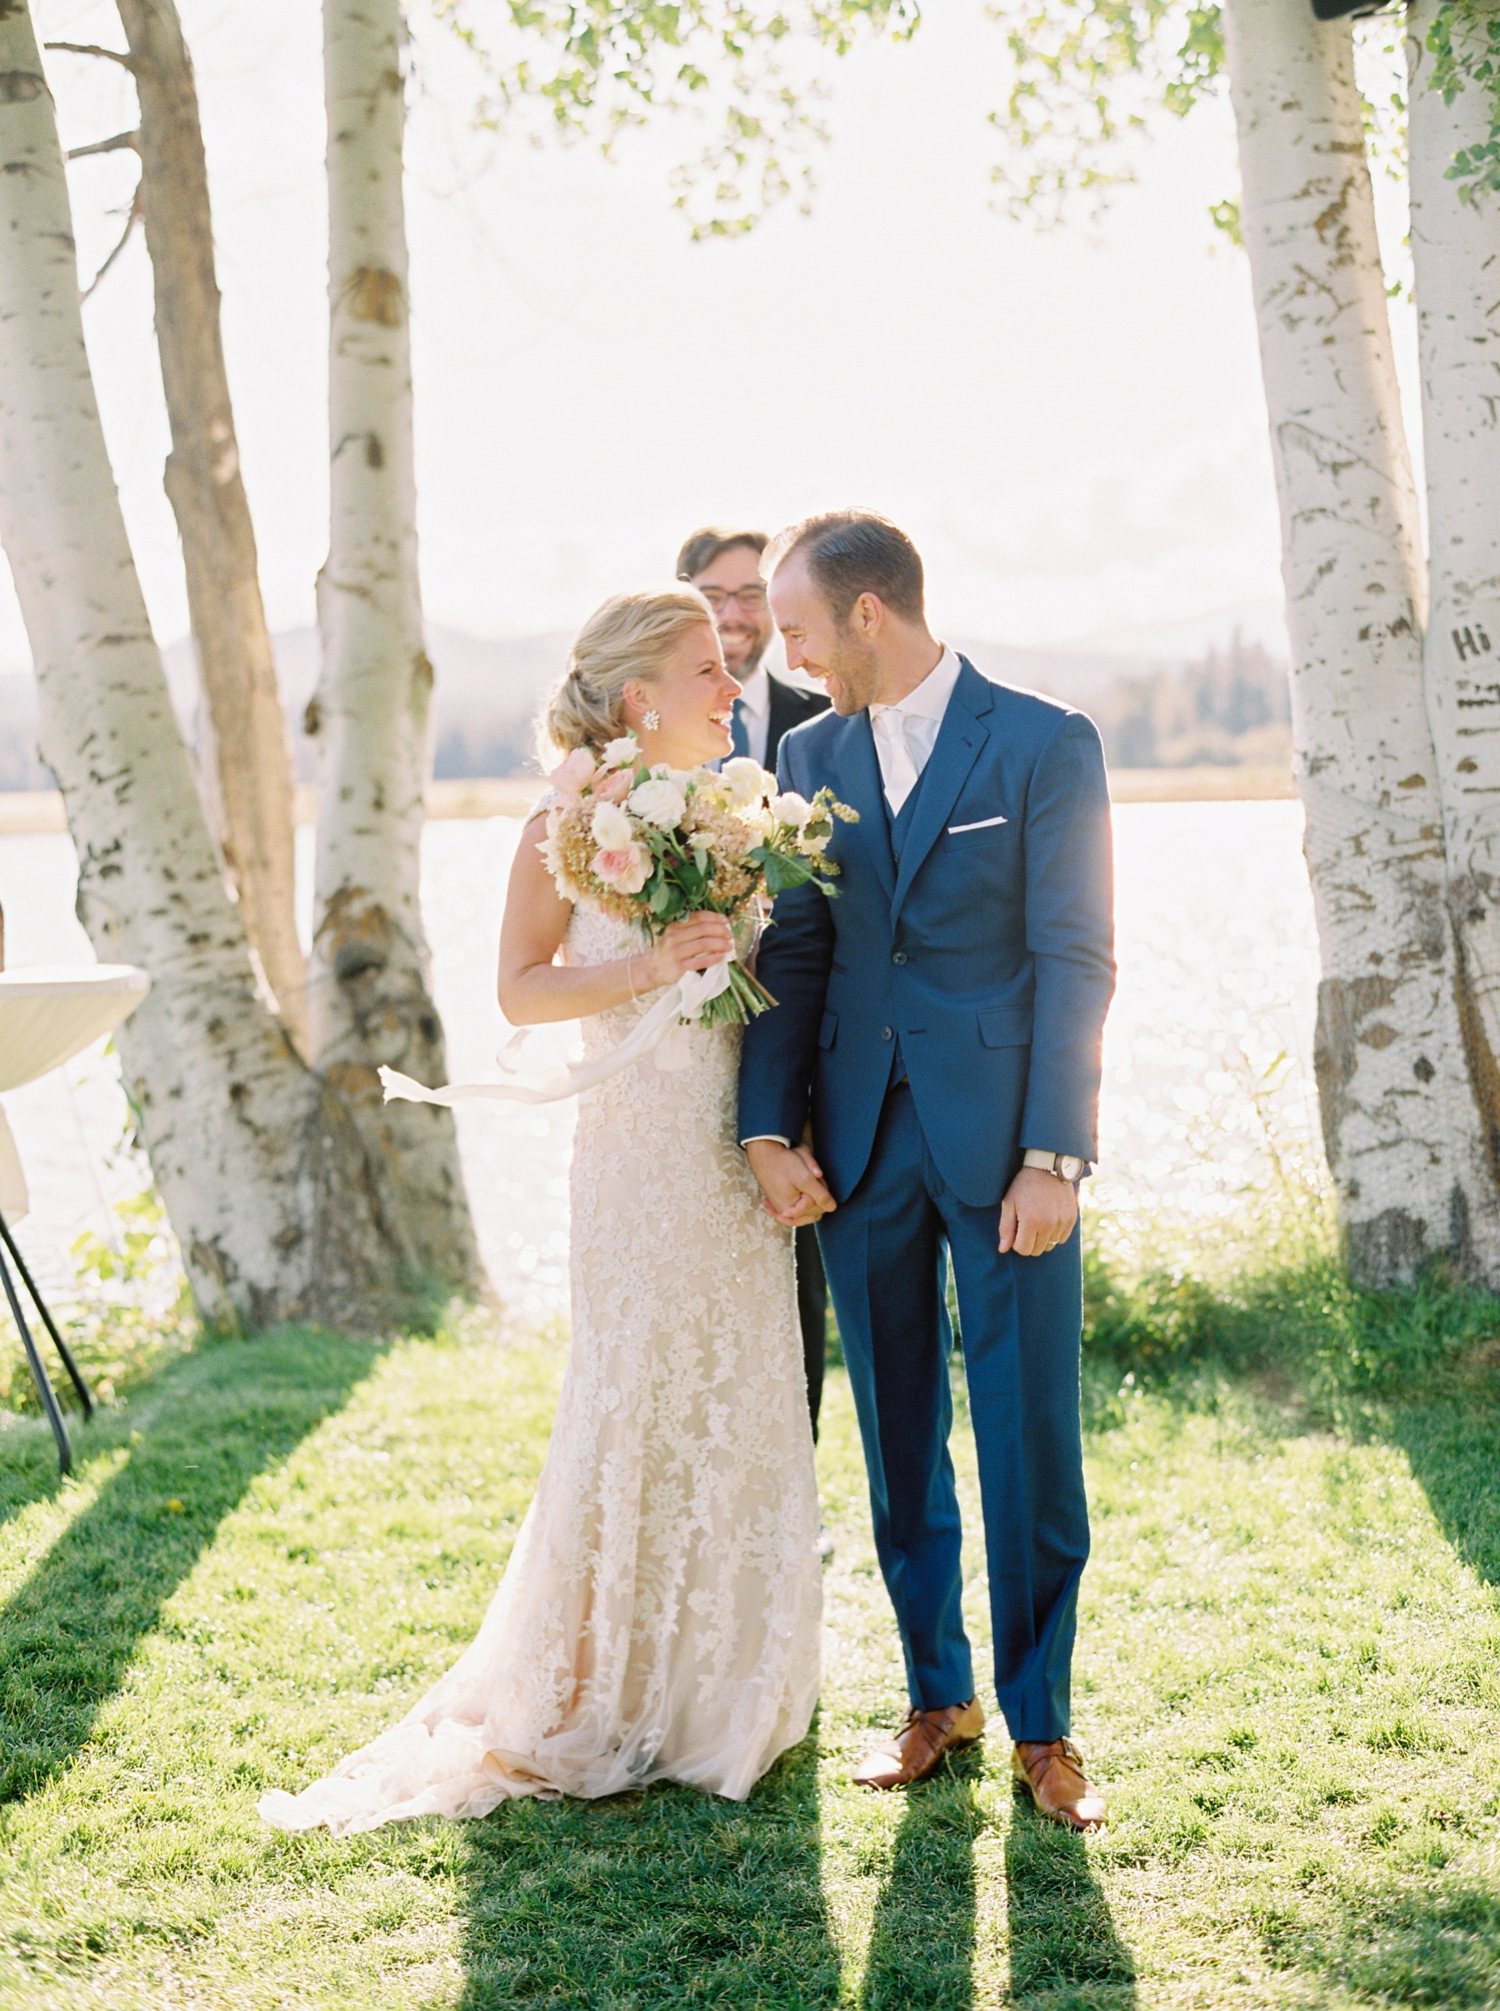 Calgary wedding photographers | oregon wedding photographers | fine art film | Justine Milton Photography | oregon wedding | wedding ceremony | bride and groom | kiss the bride